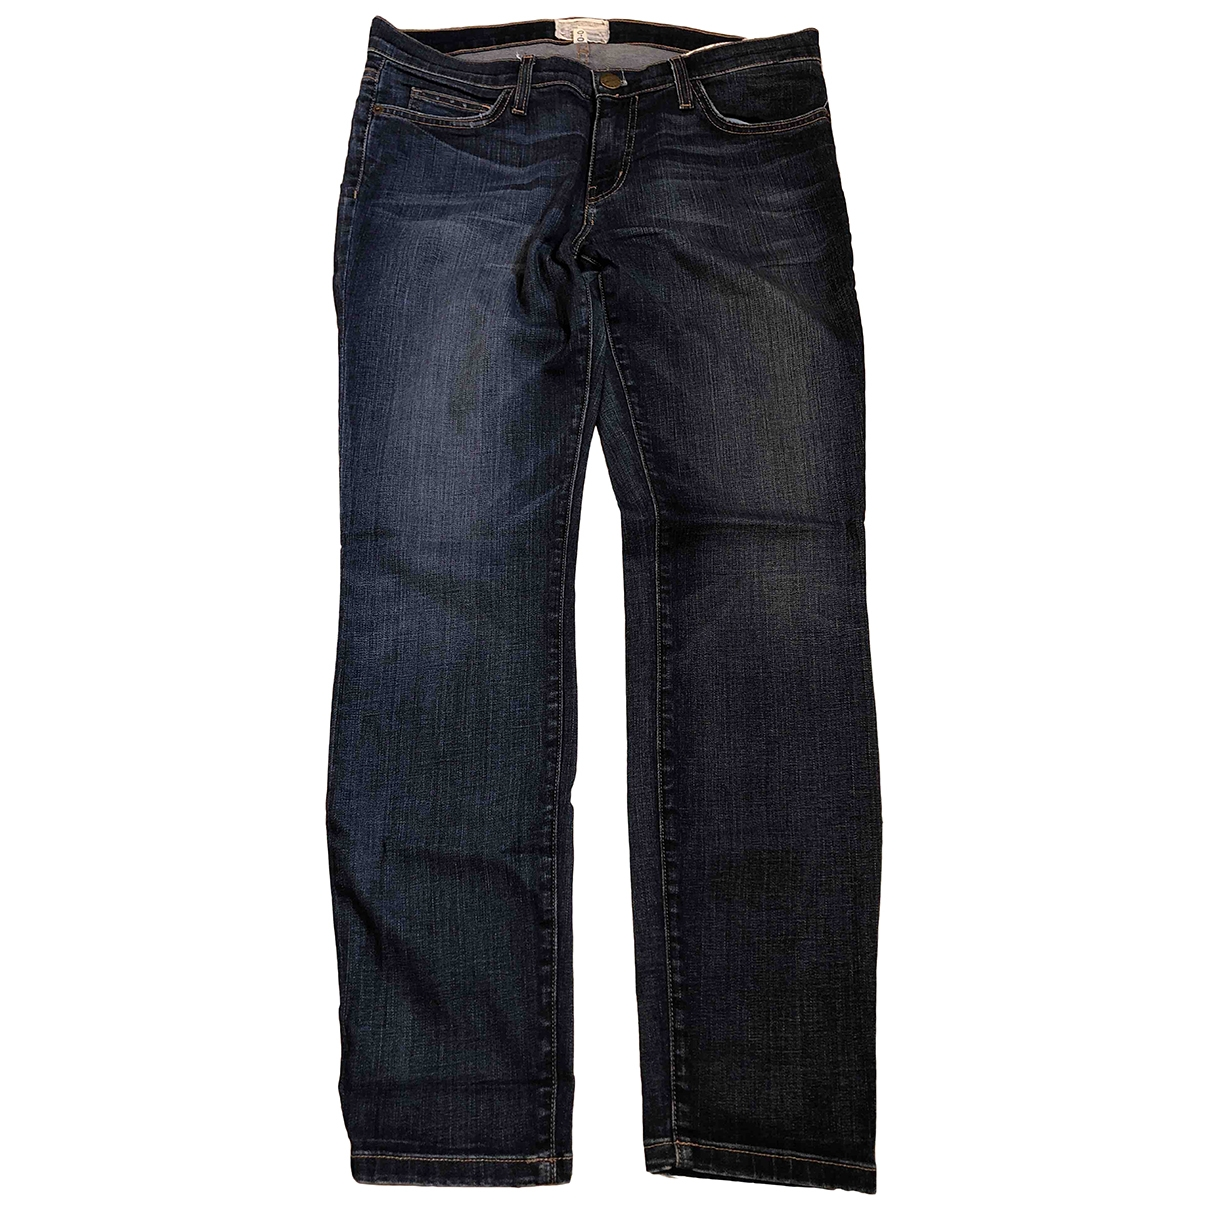 Current Elliott \N Blue Denim - Jeans Jeans for Women 30 US